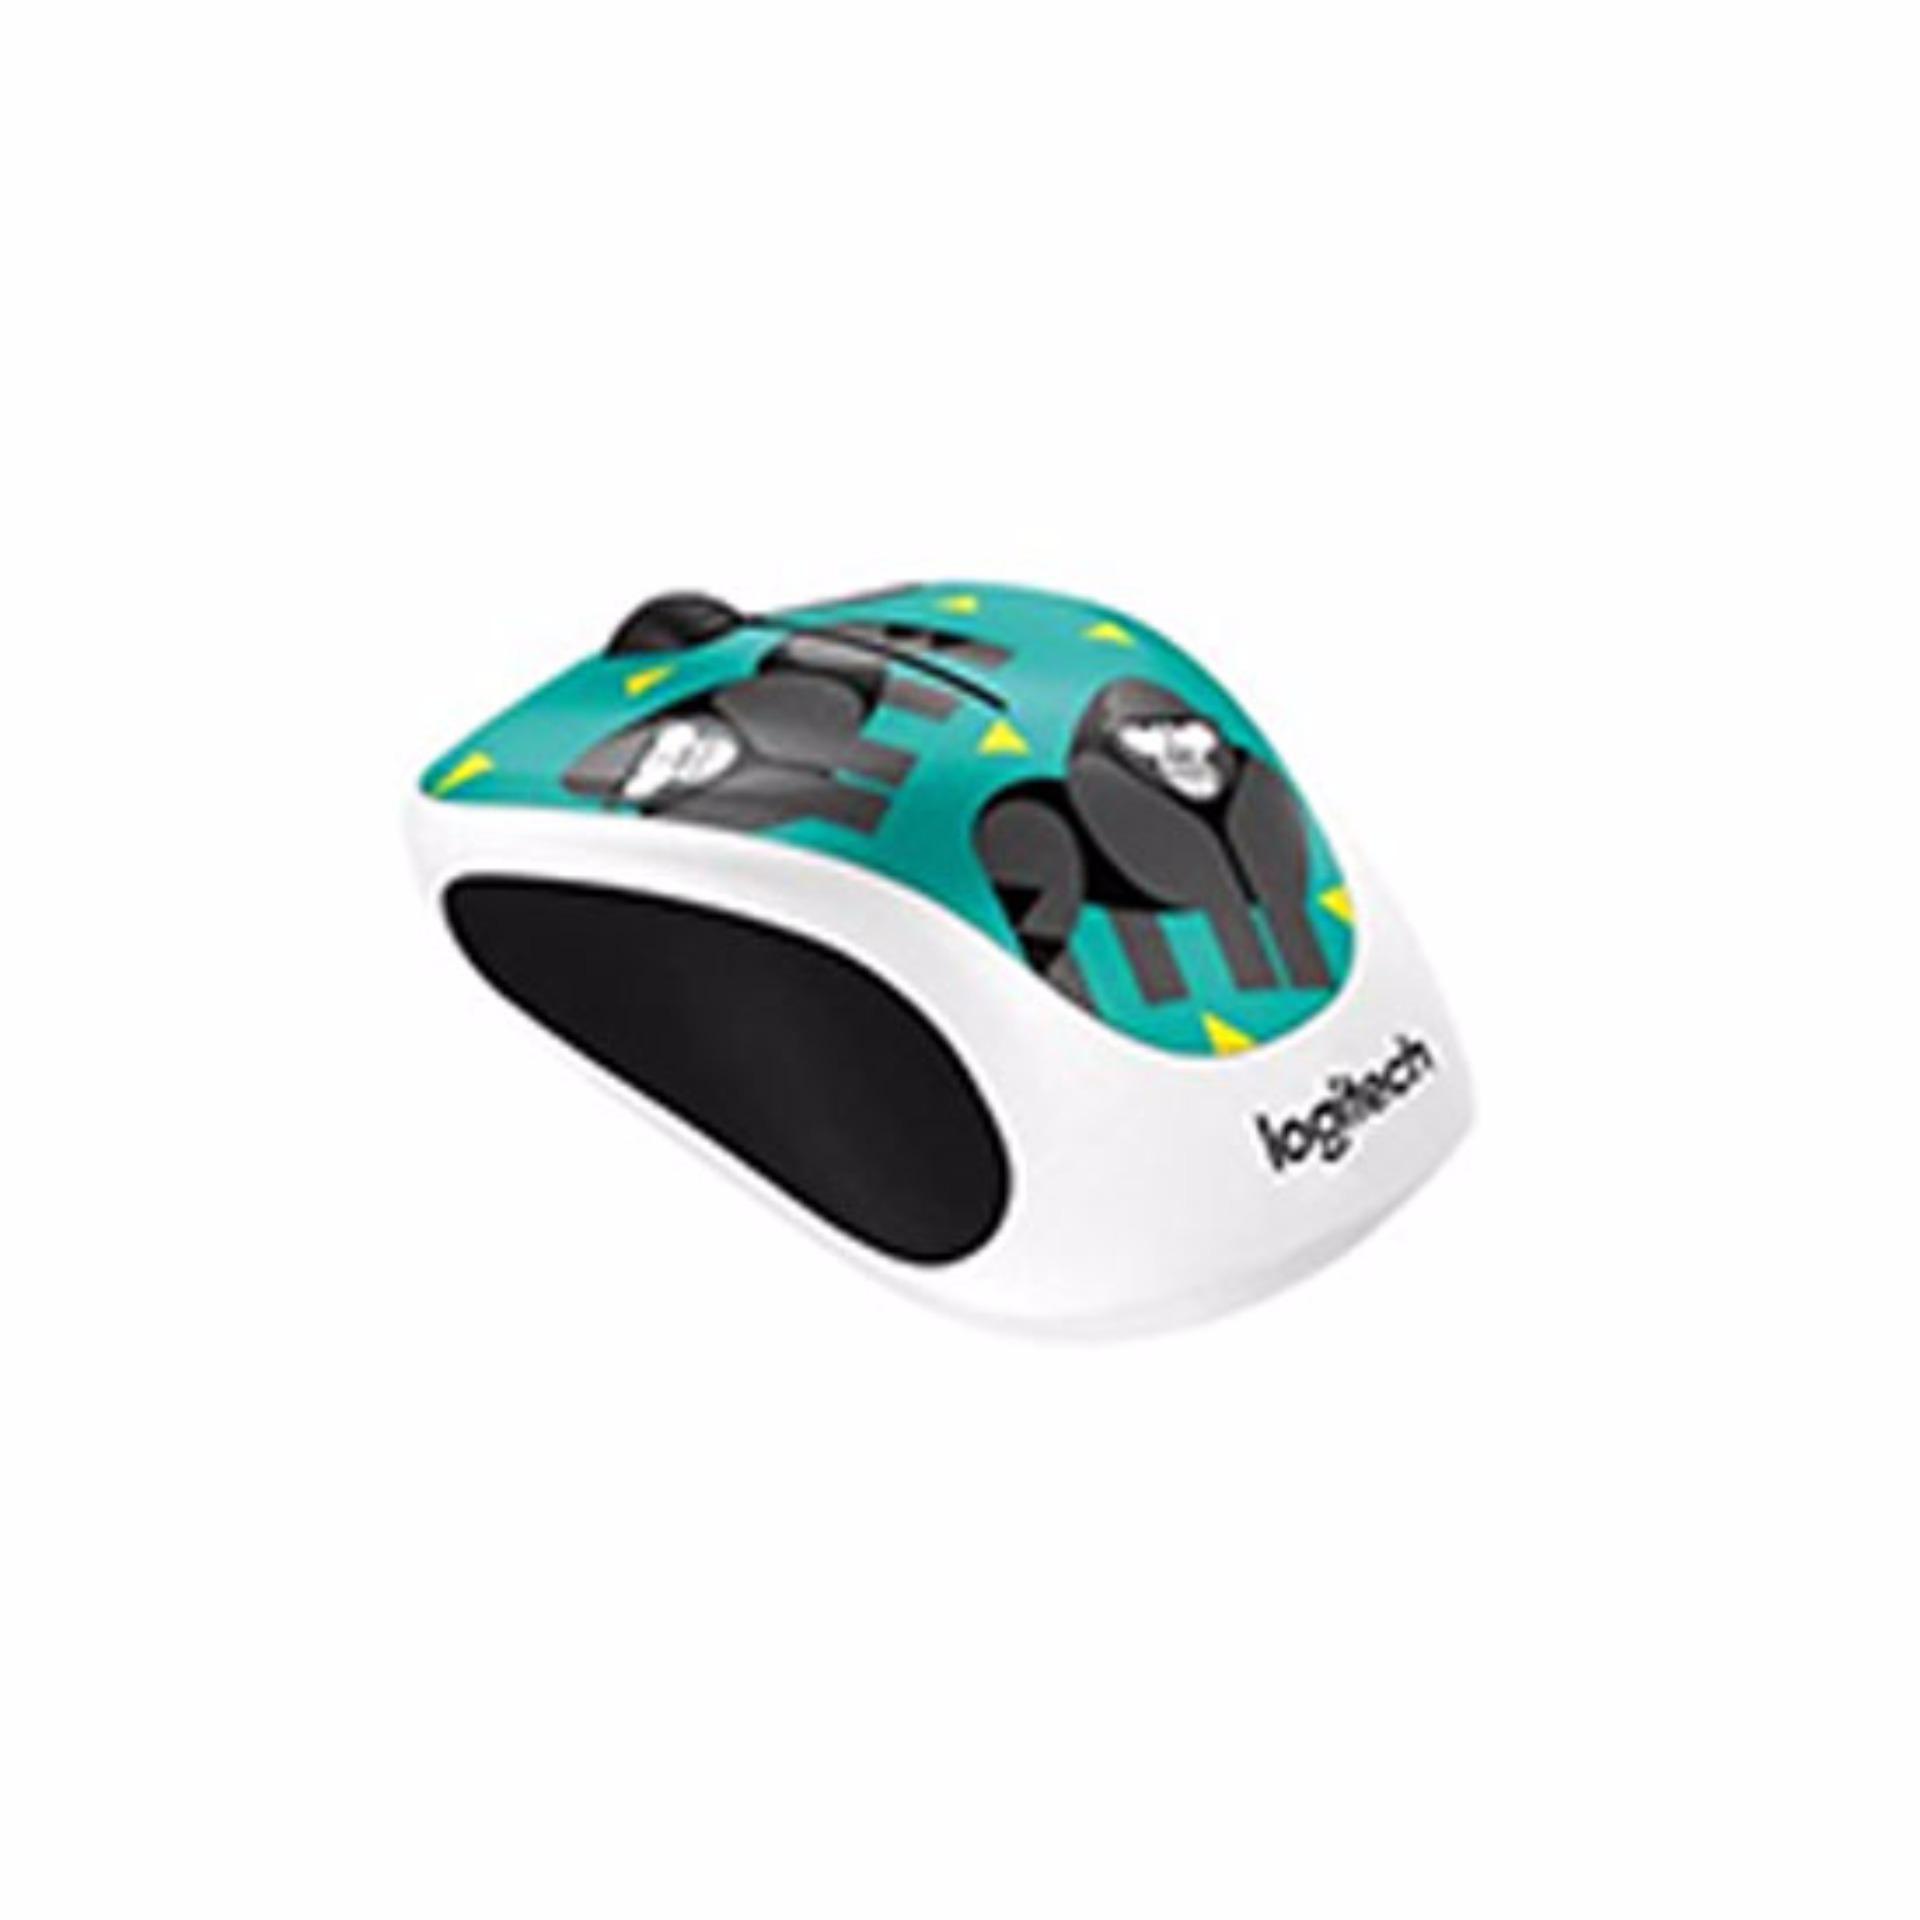 Jual Murah Mouse Logitech Wireless M238 Terbaru 2018 Toner Bubuk Fuji Xerox P115wp115bm115wm115fm115fw Diamond 500 Gram Philippines Gorilla The Best Price